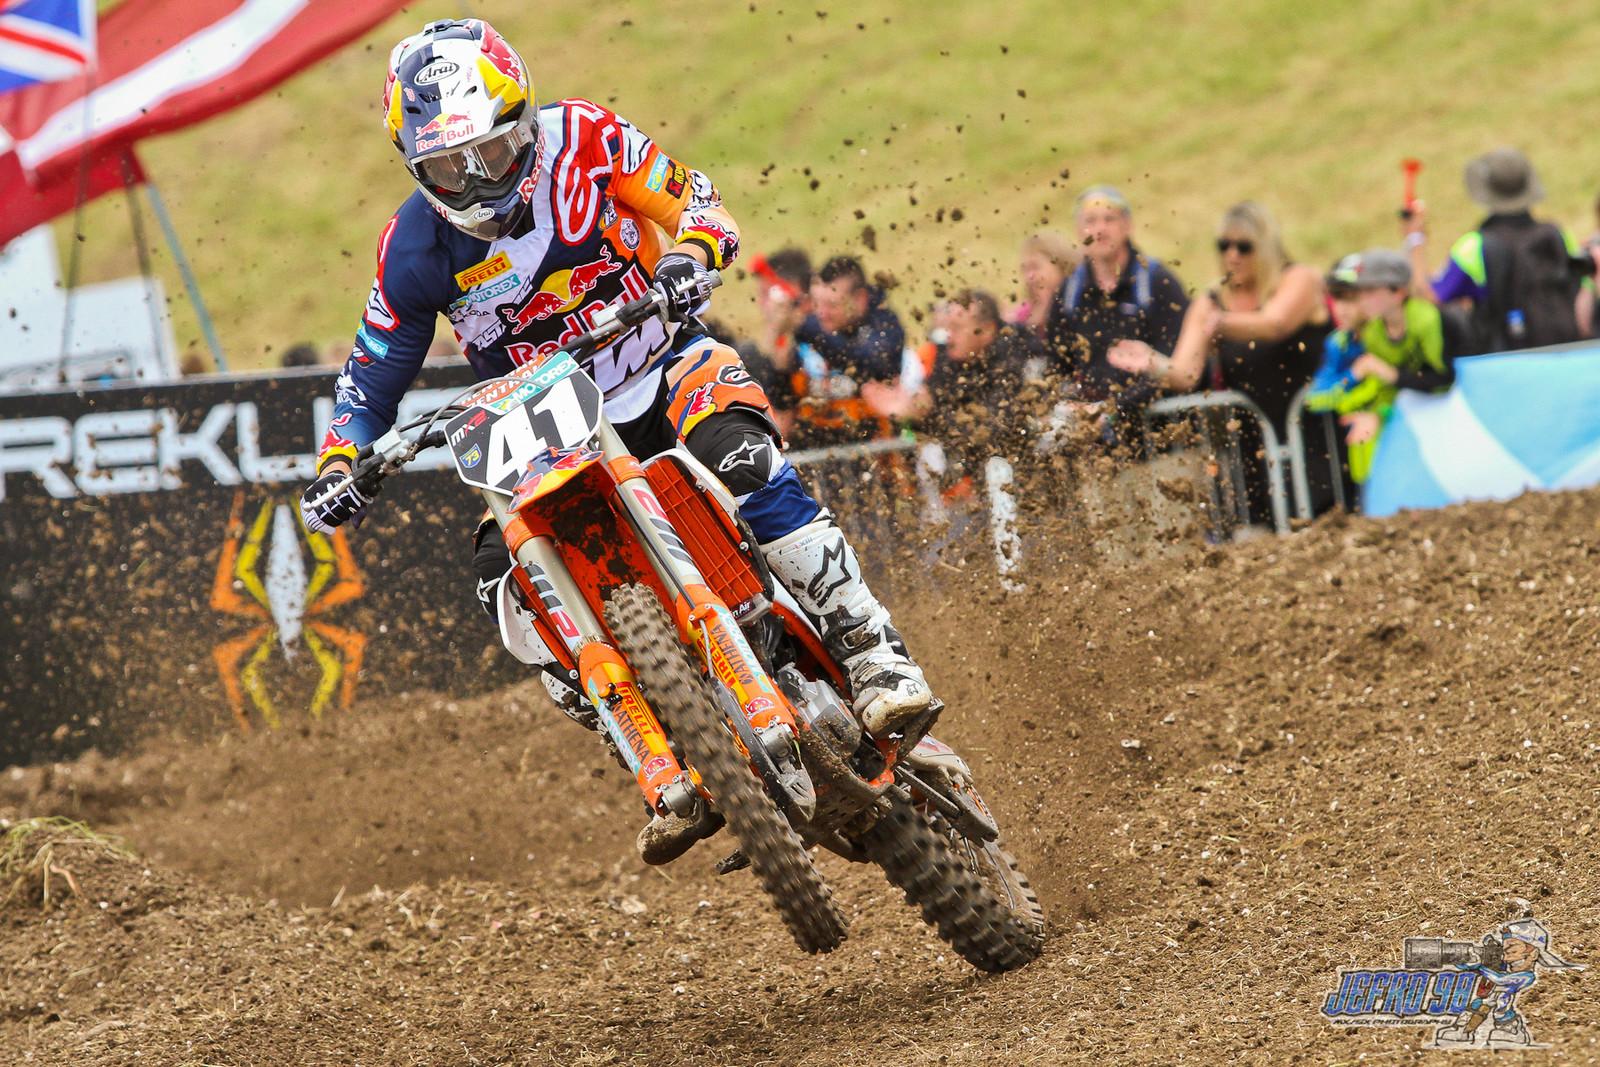 Pauls Jonass - Photo Gallery: MXGP of Great Britain - Motocross Pictures - Vital MX